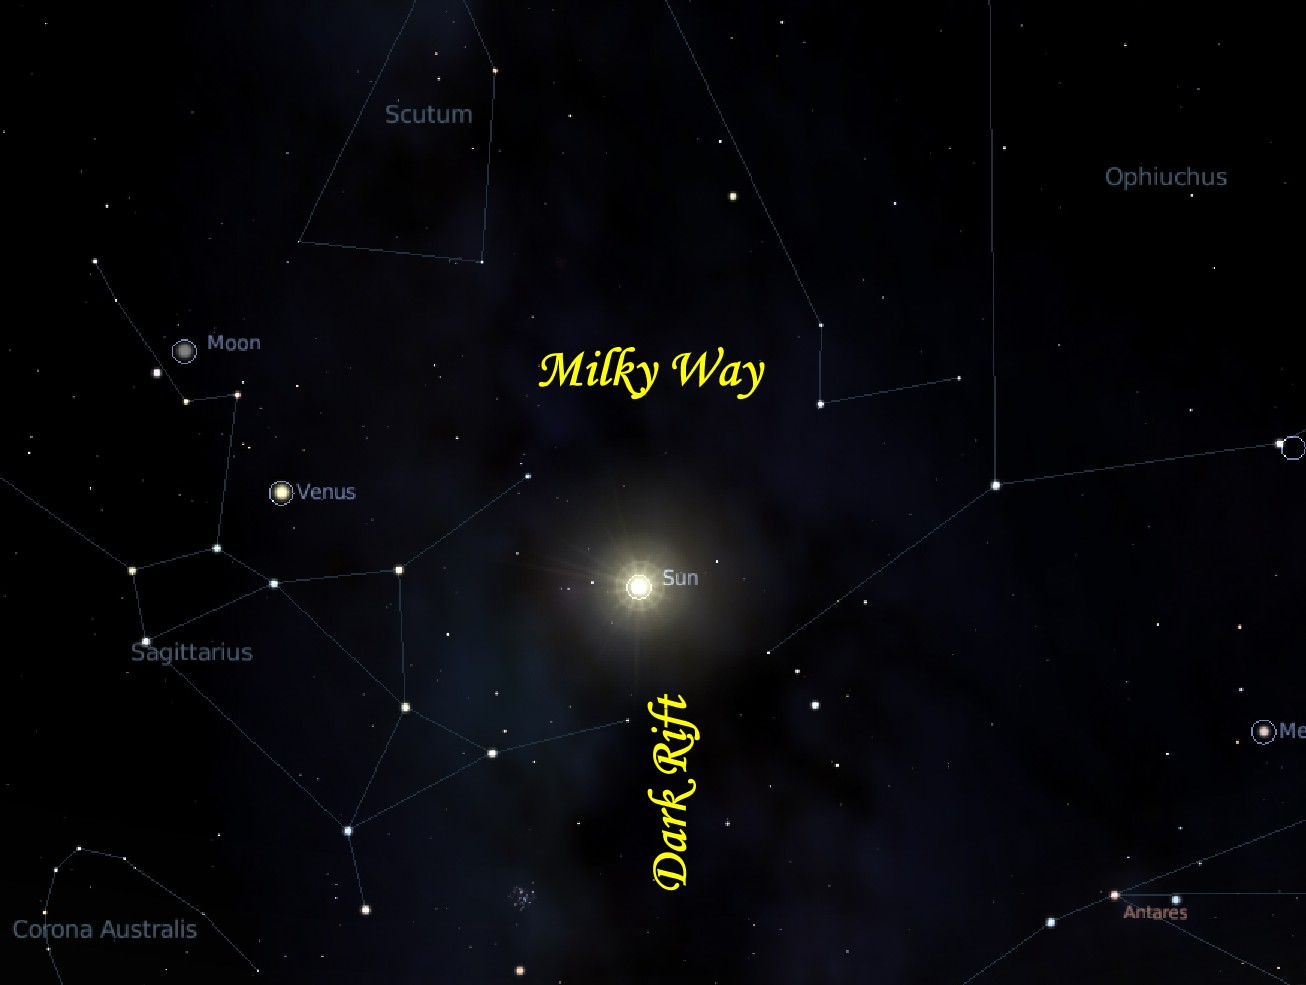 milky way solar system - photo #39